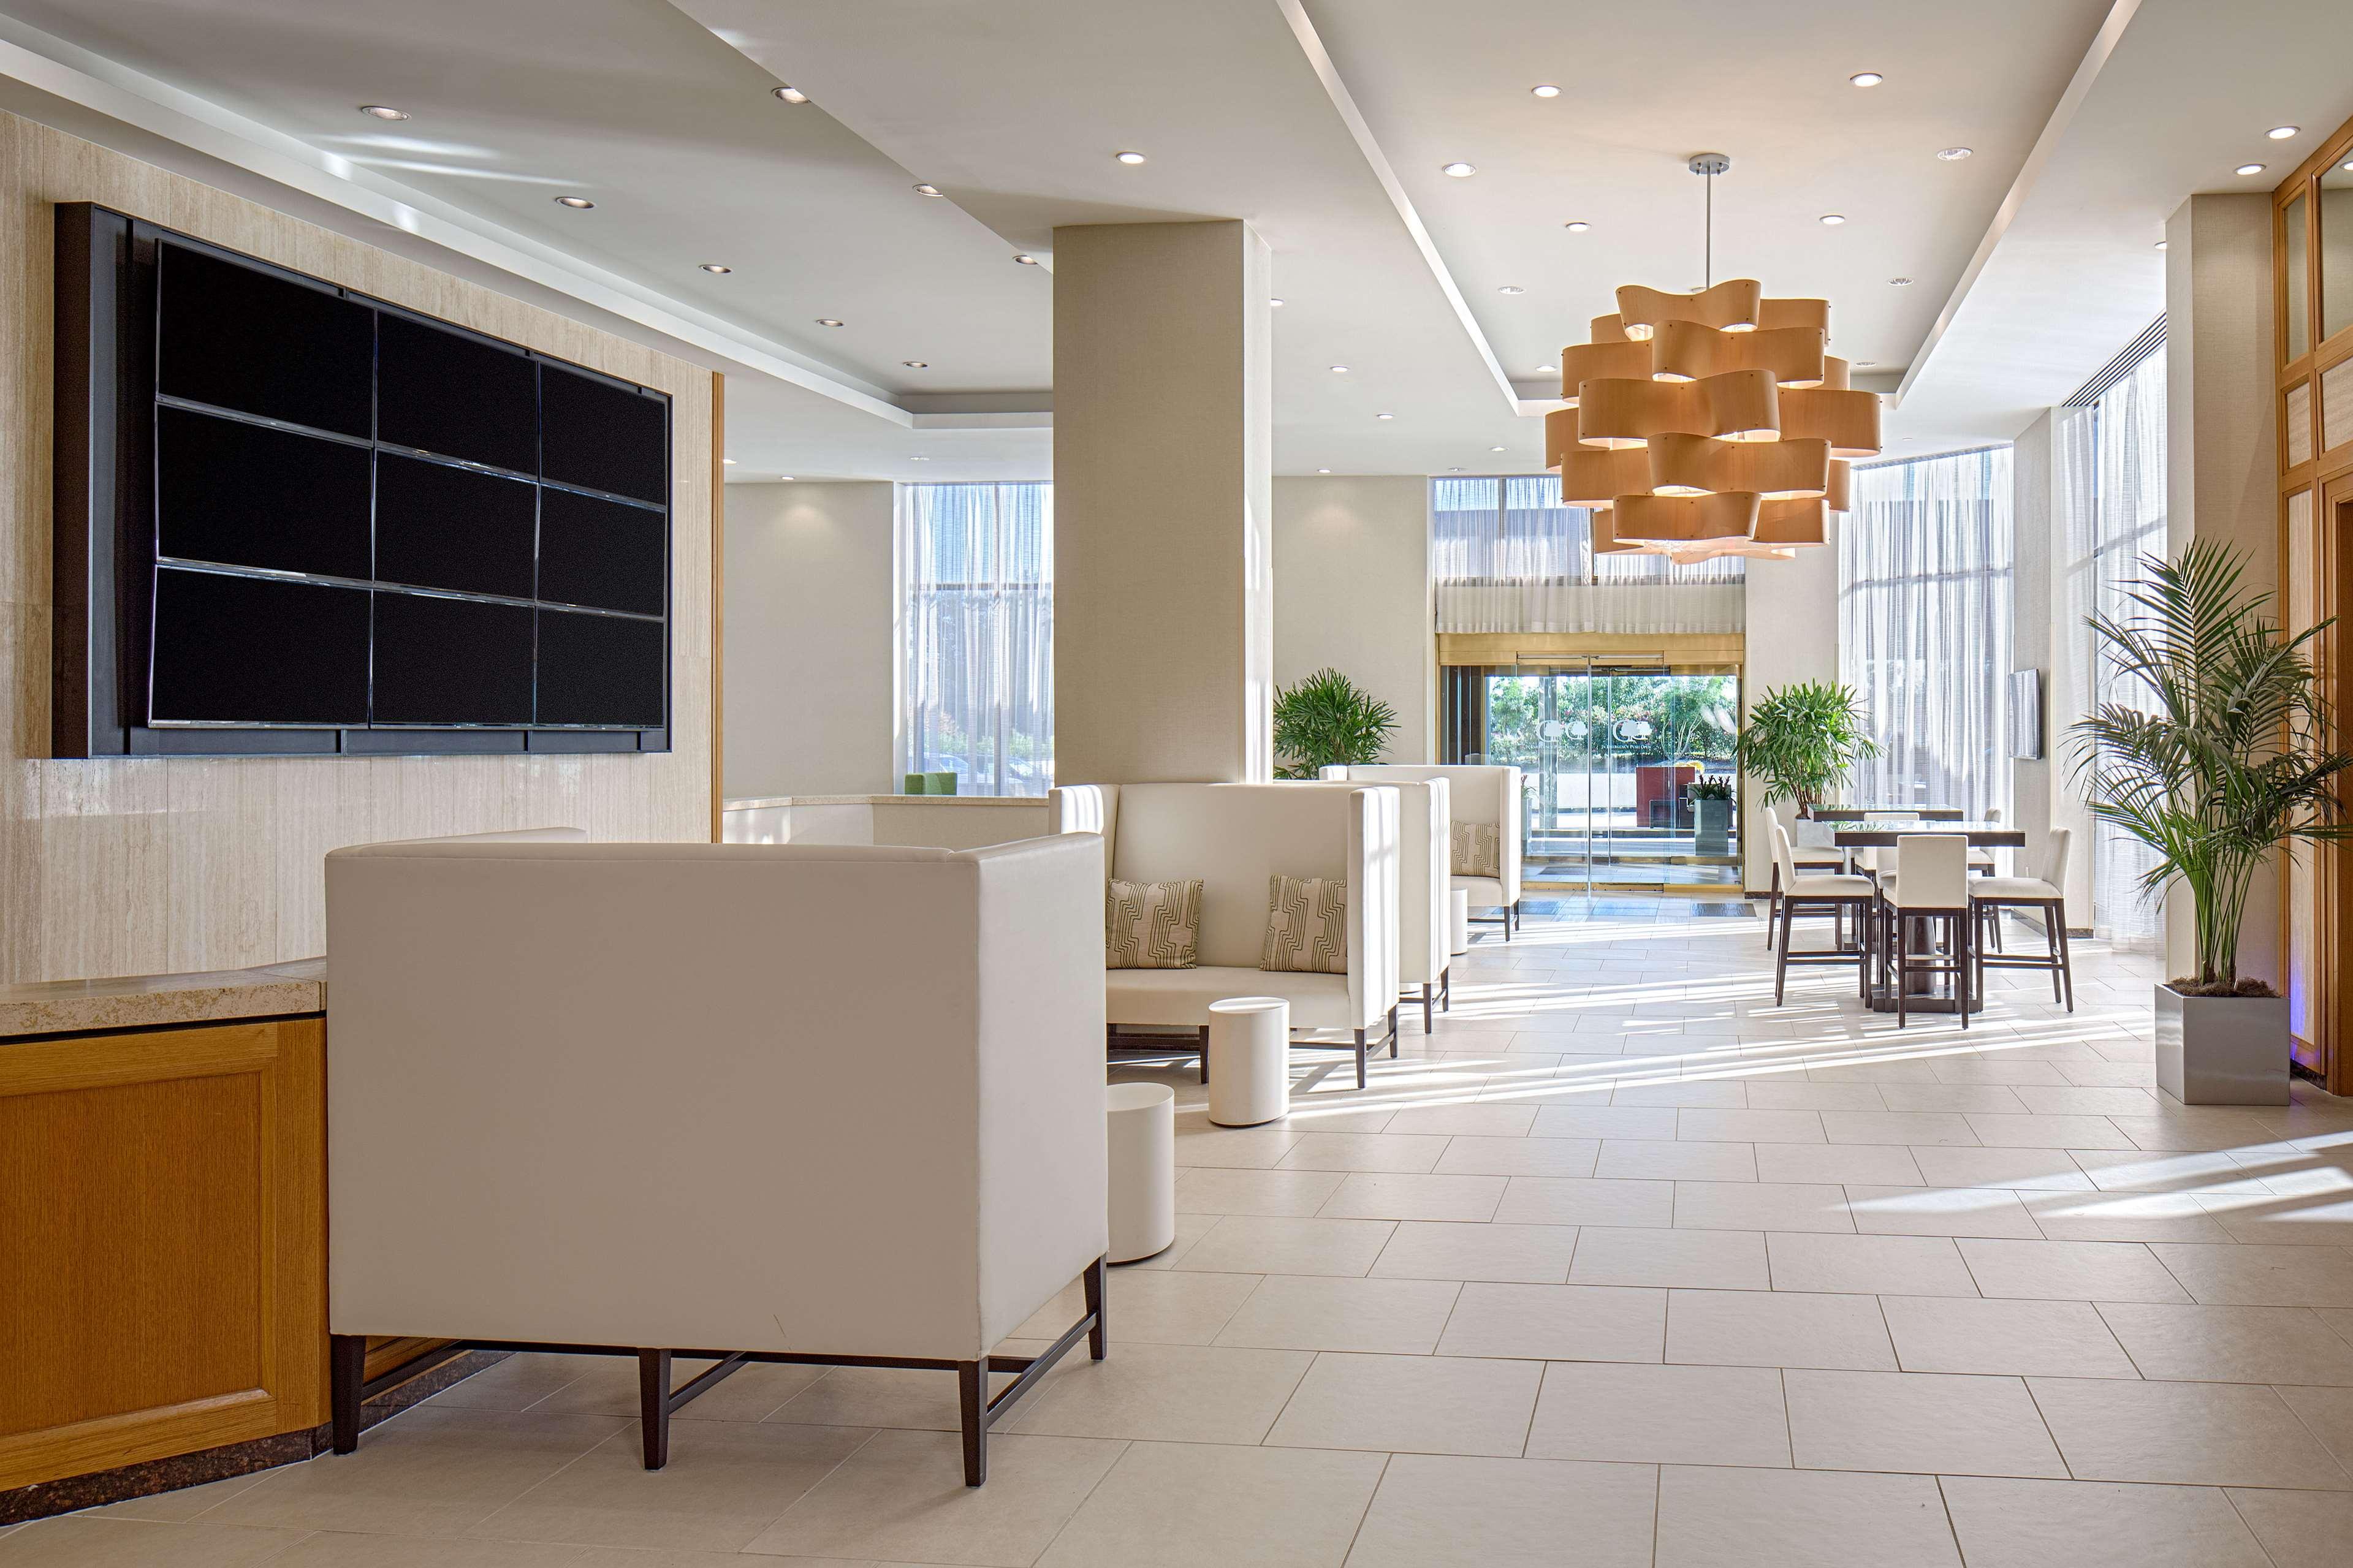 DoubleTree by Hilton Hotel Houston - Greenway Plaza image 3